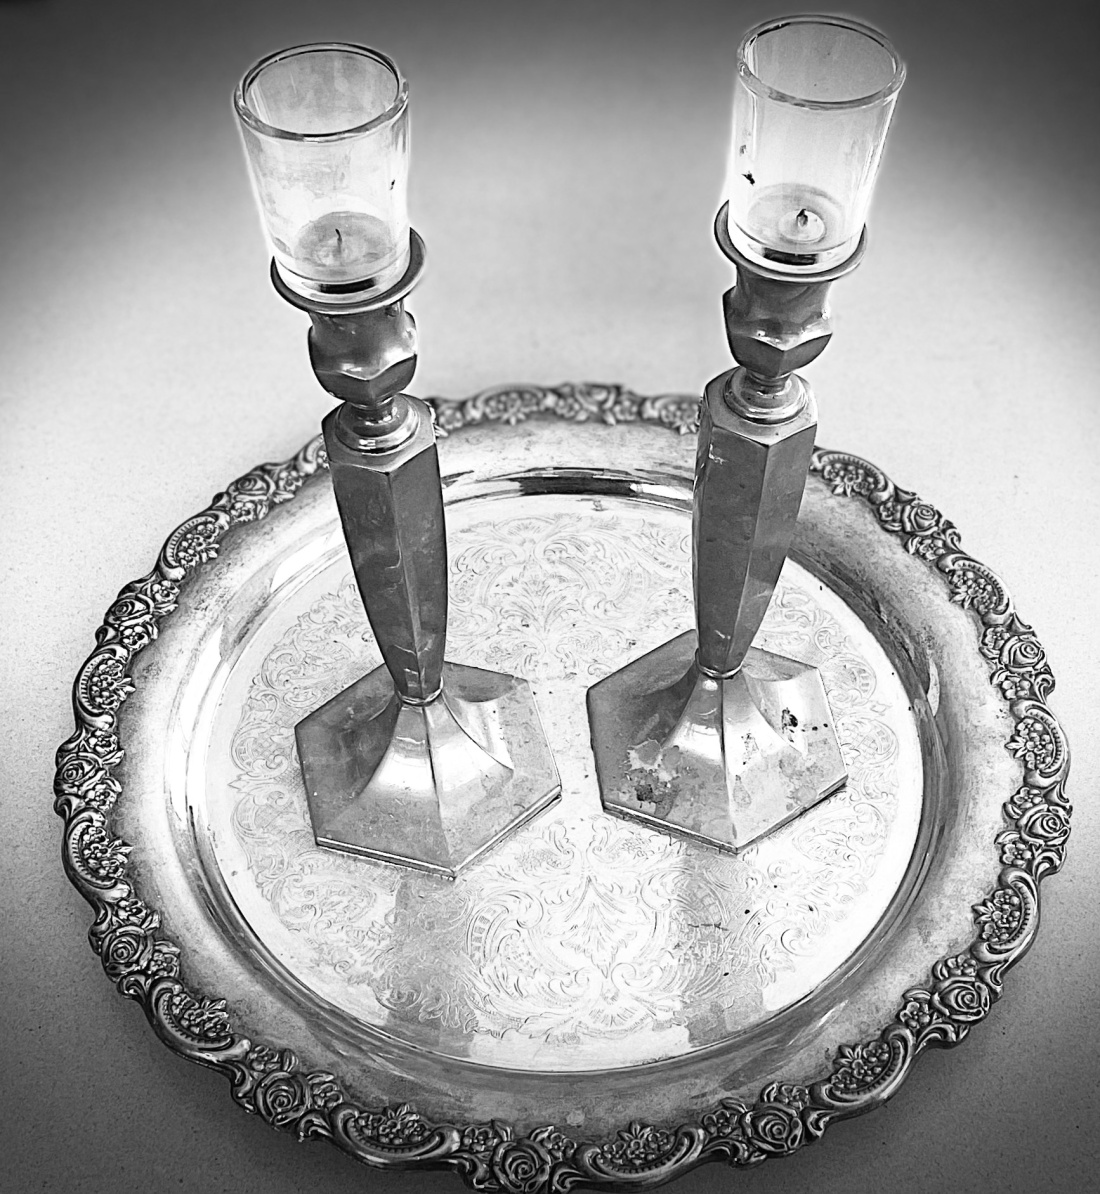 My Bubbe's Shabbat Candlesticks